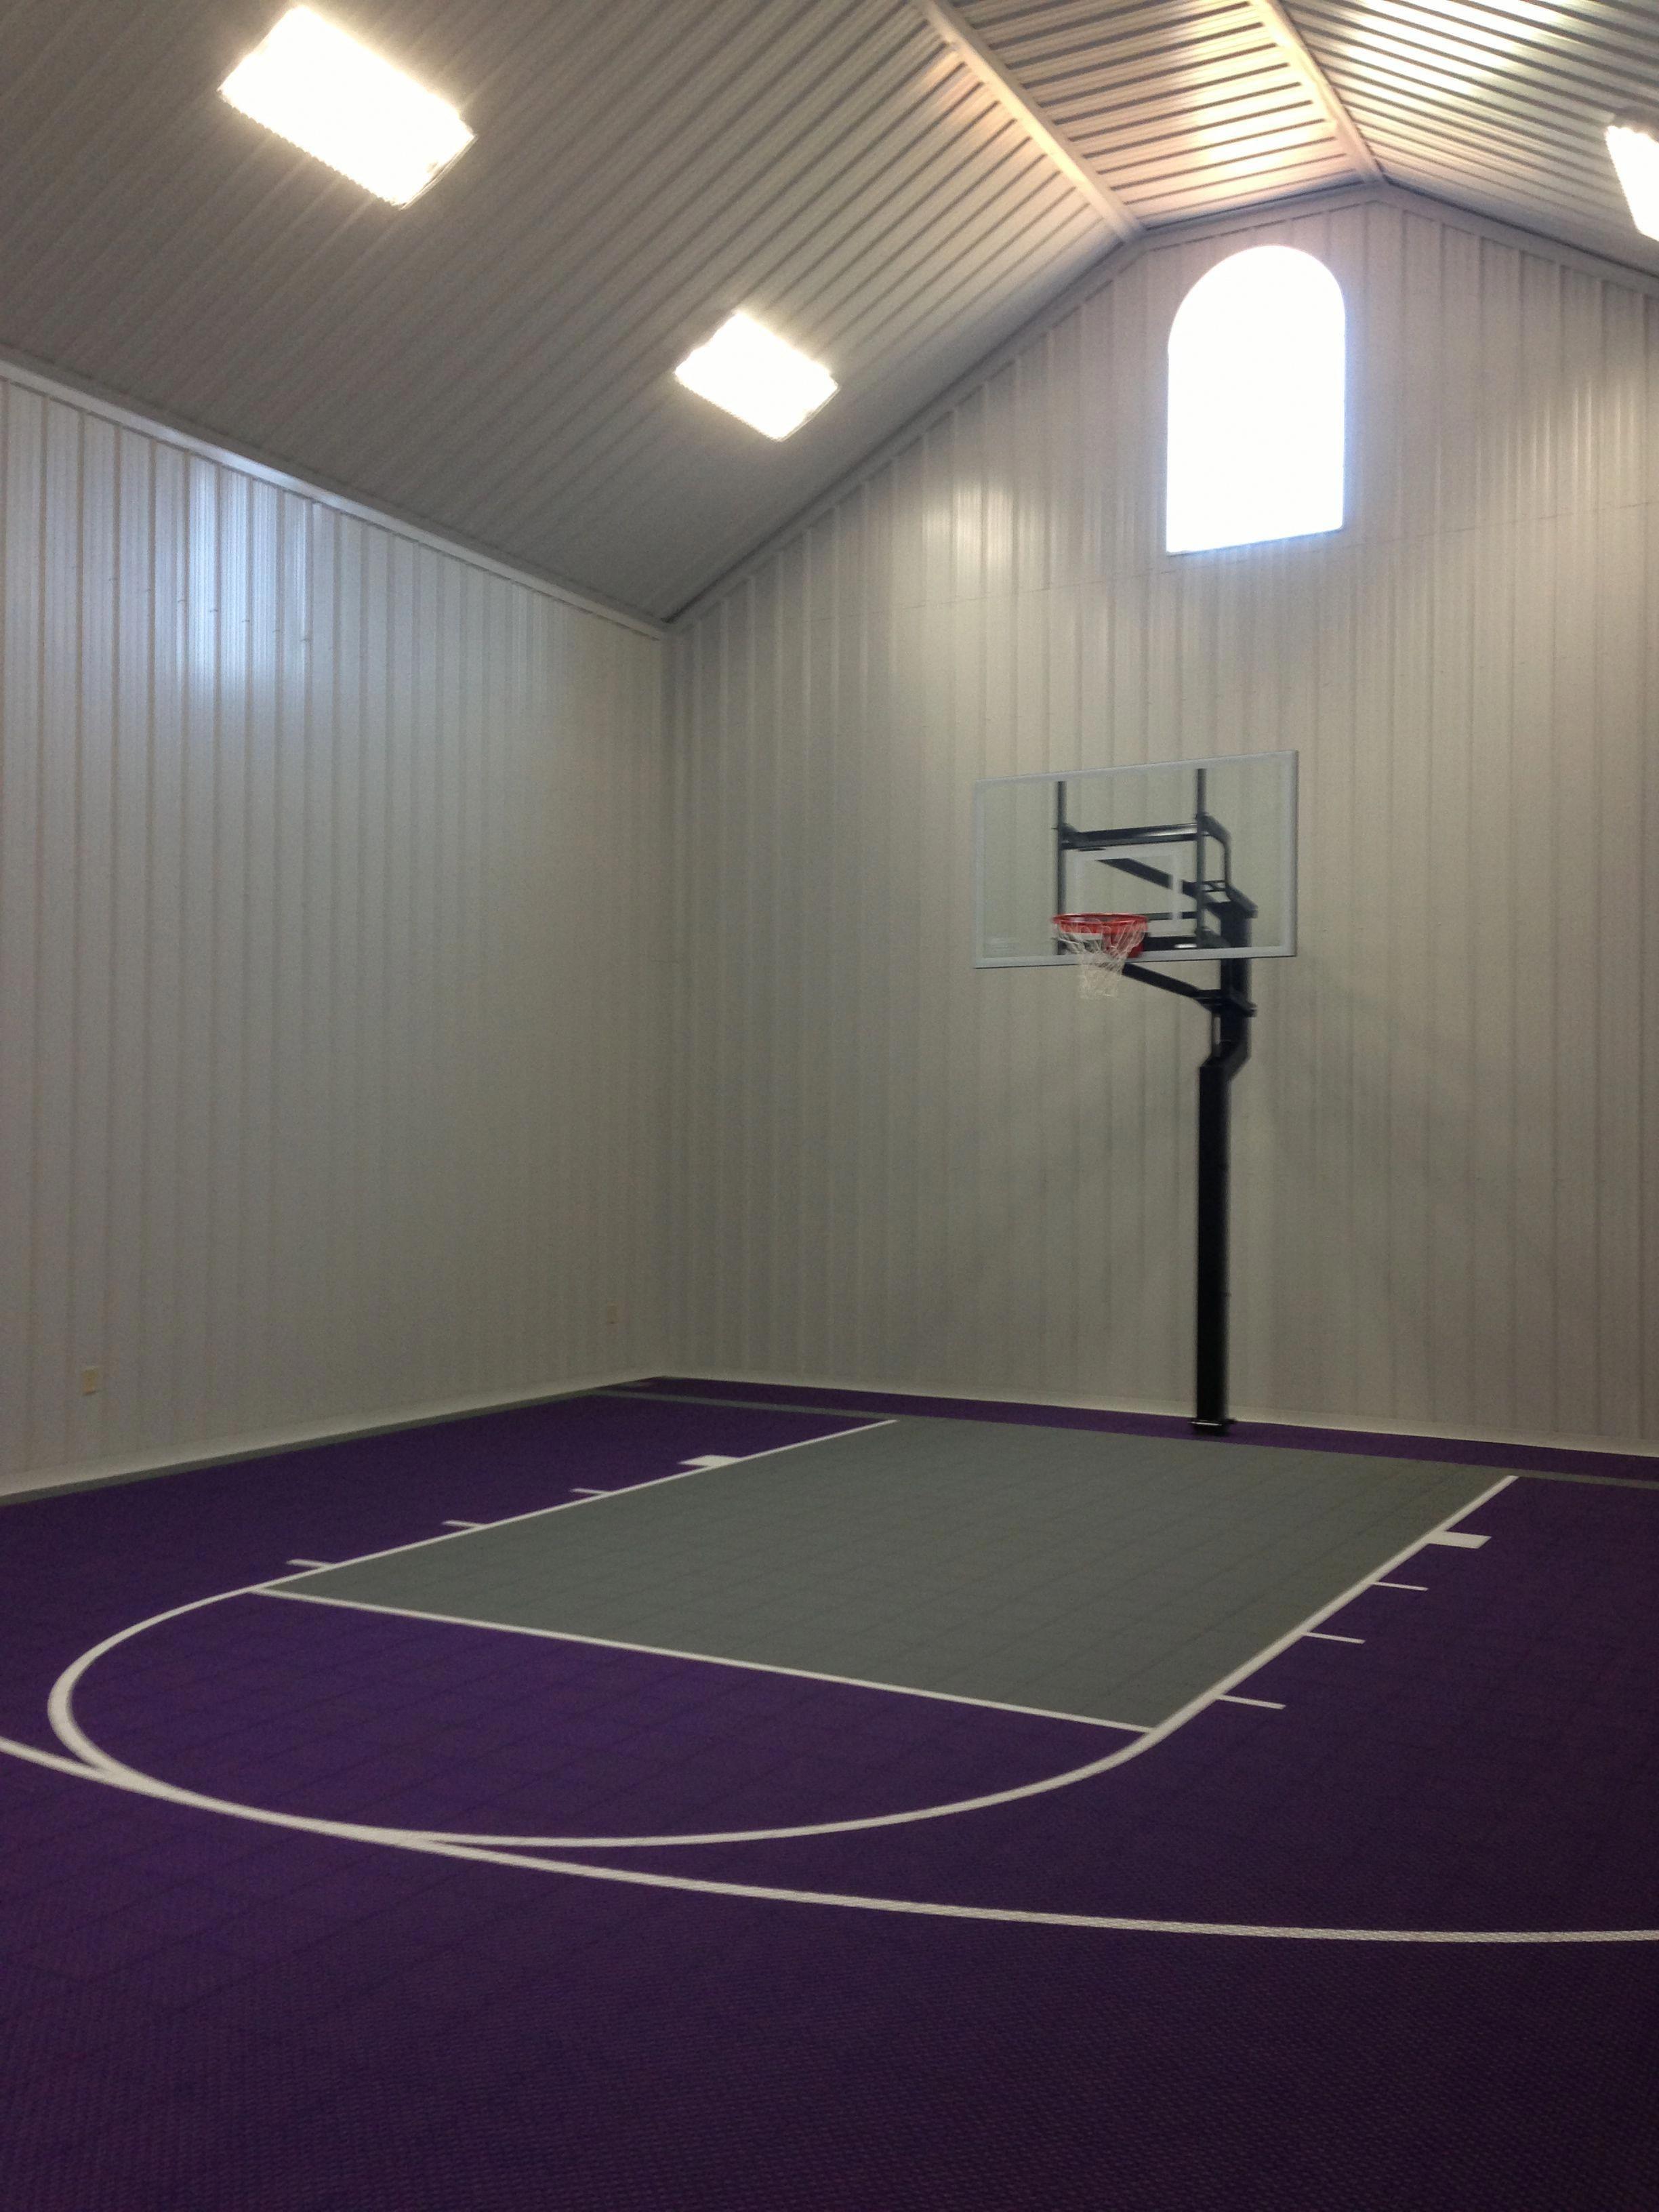 Open Cell Foam on an indoor basketball court www